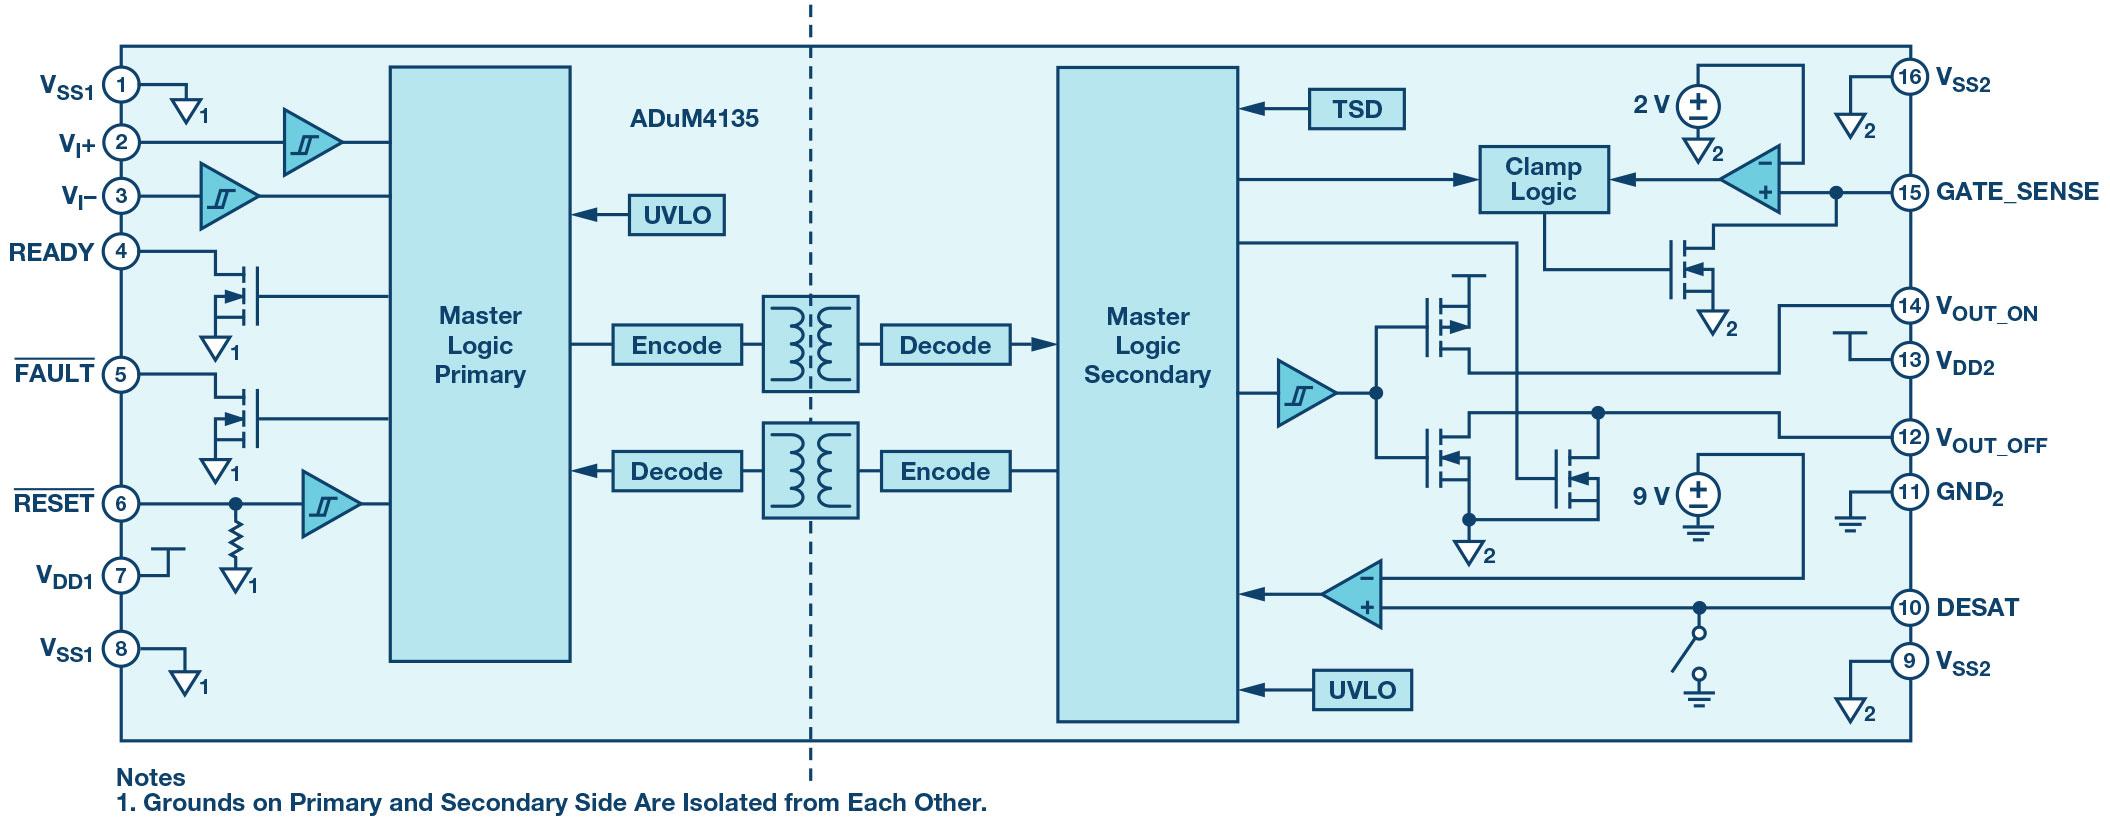 small resolution of adum4135 block diagram